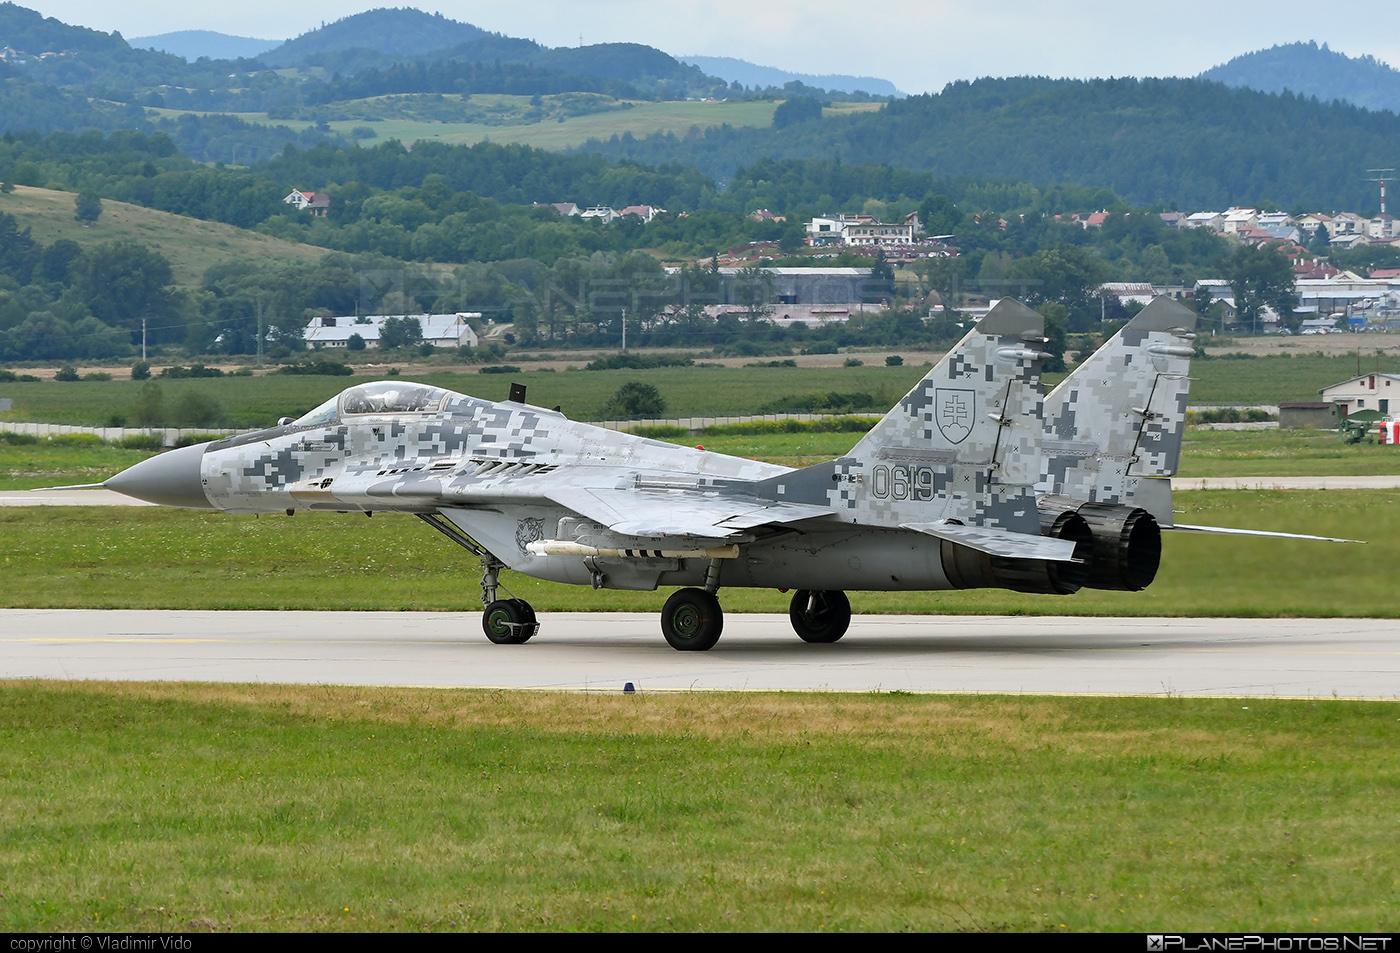 Mikoyan-Gurevich MiG-29AS - 0619 operated by Vzdušné sily OS SR (Slovak Air Force) #mig #mig29 #mig29as #mikoyangurevich #siaf2019 #slovakairforce #vzdusnesilyossr